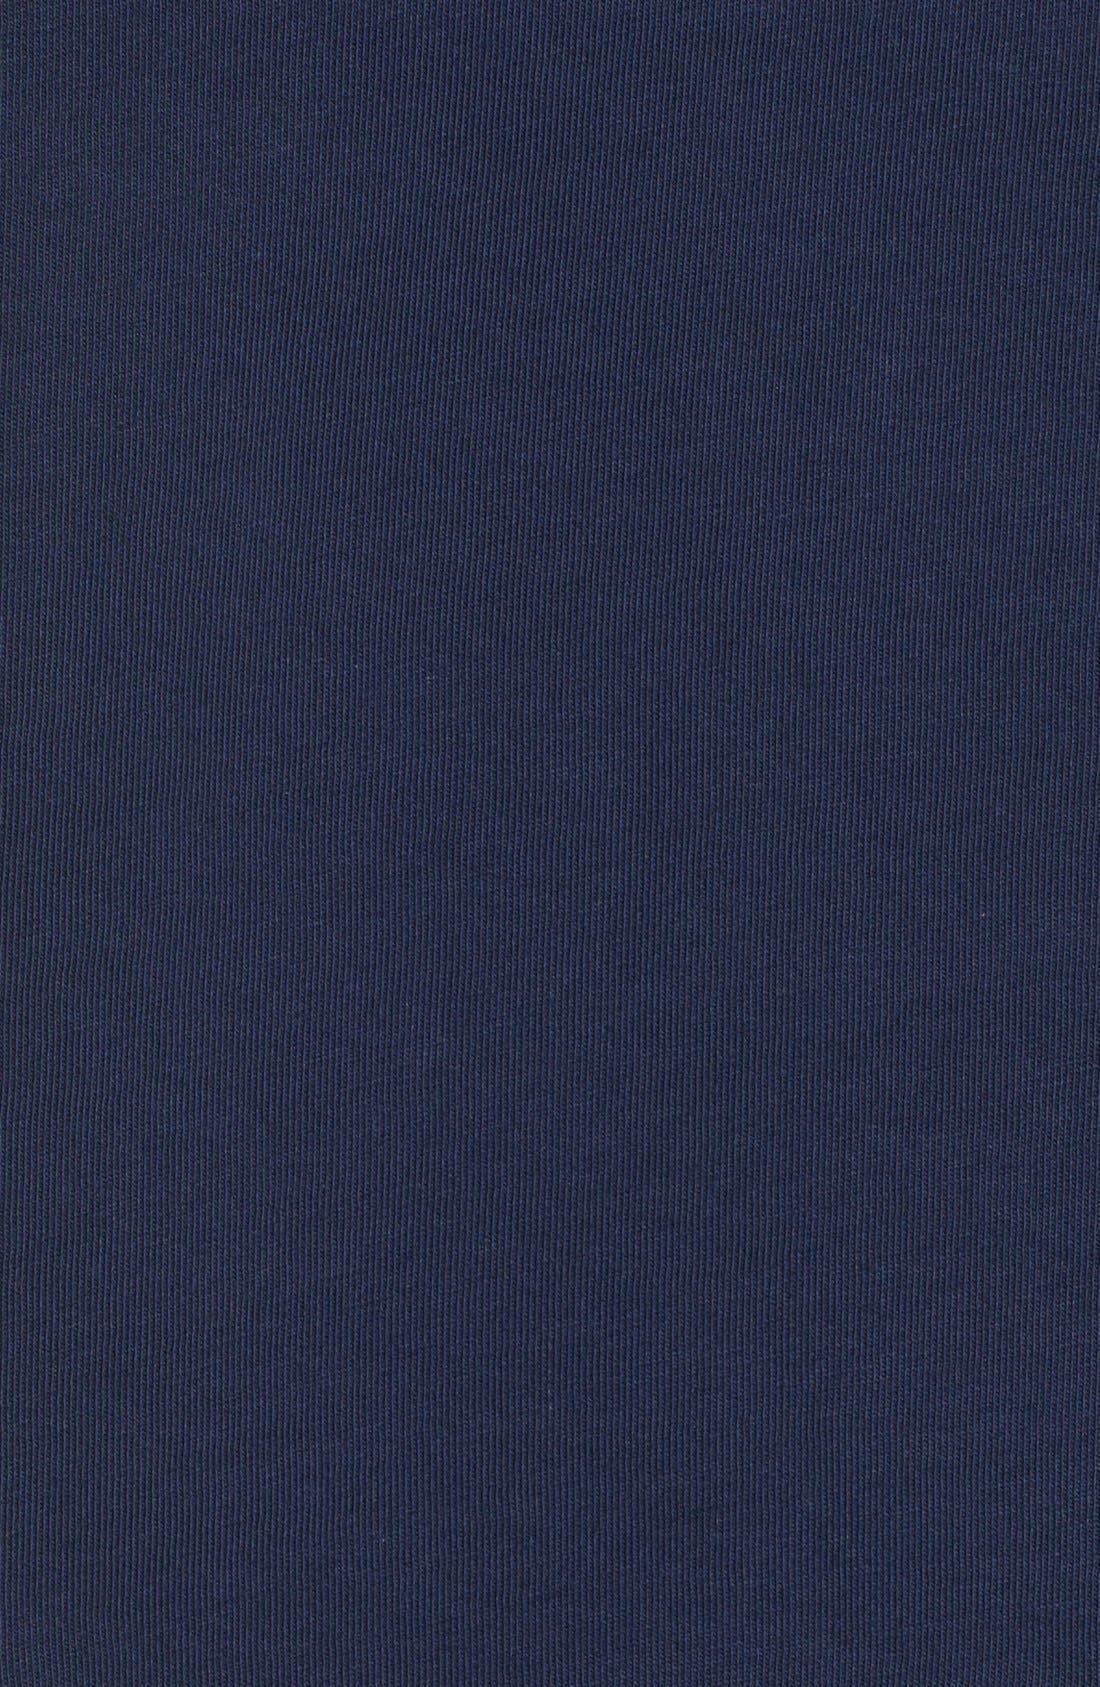 Alternate Image 5  - adidas Originals 'BG' Crop Cotton Tee